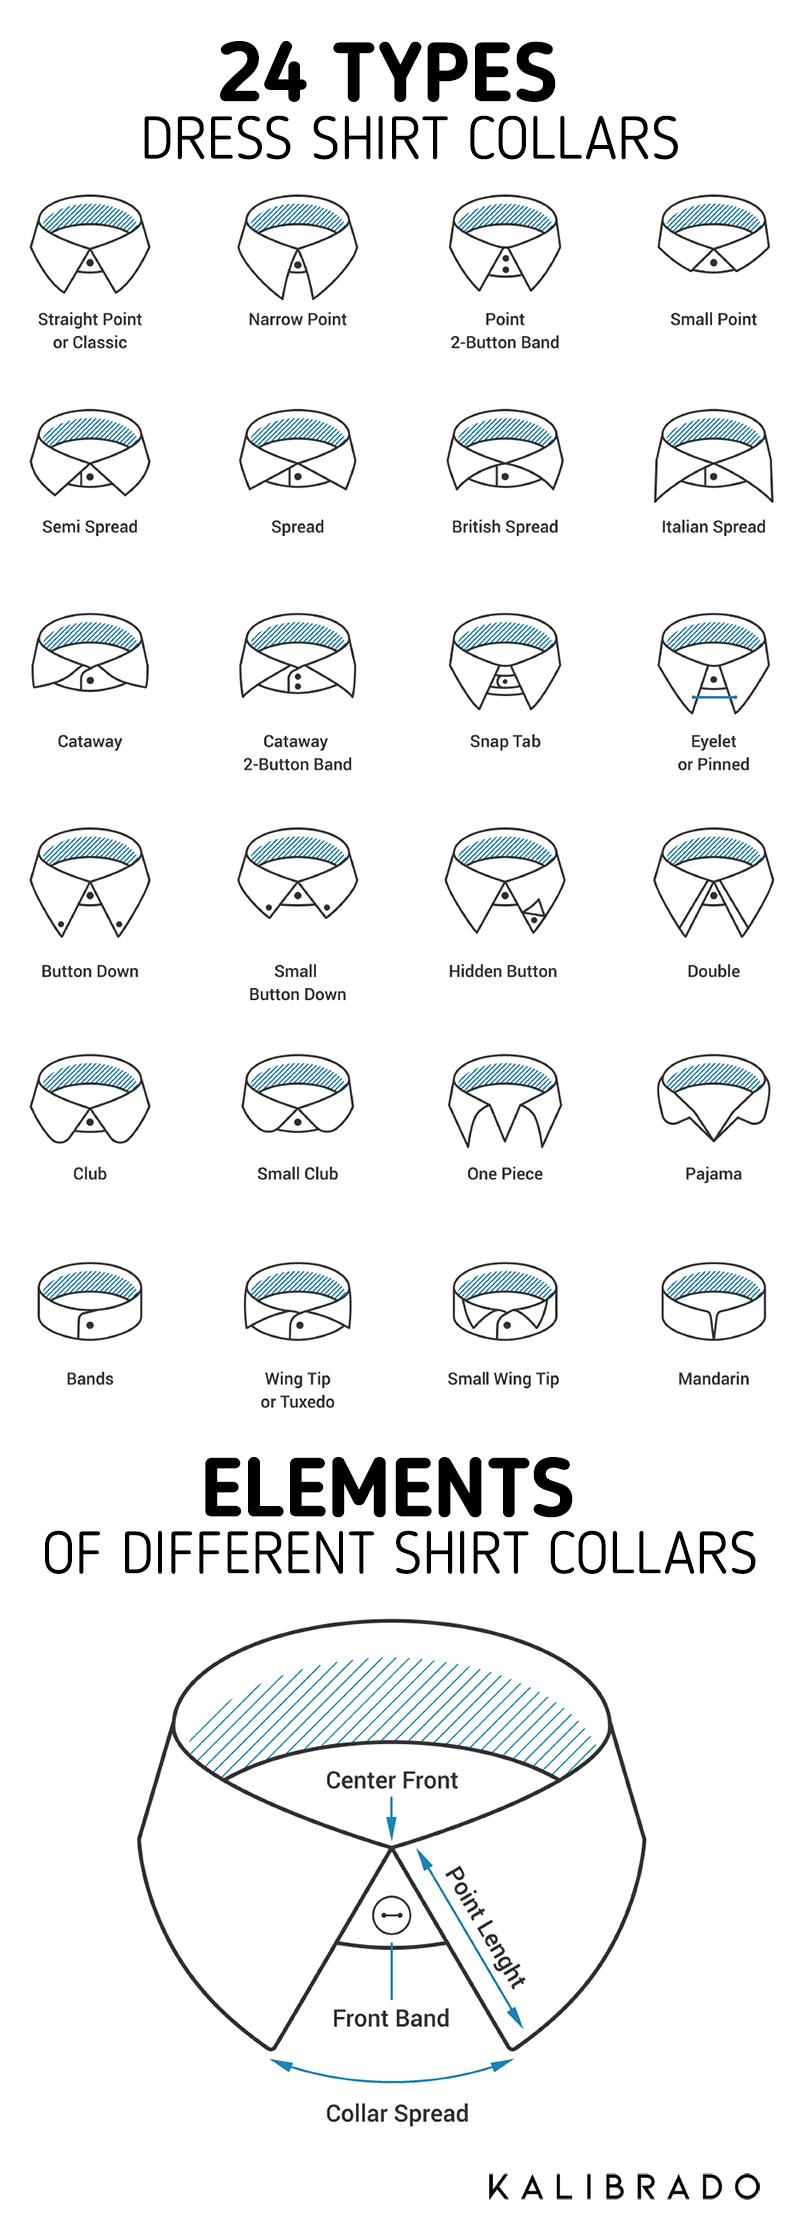 Types of Men's Dress Shirt Collars